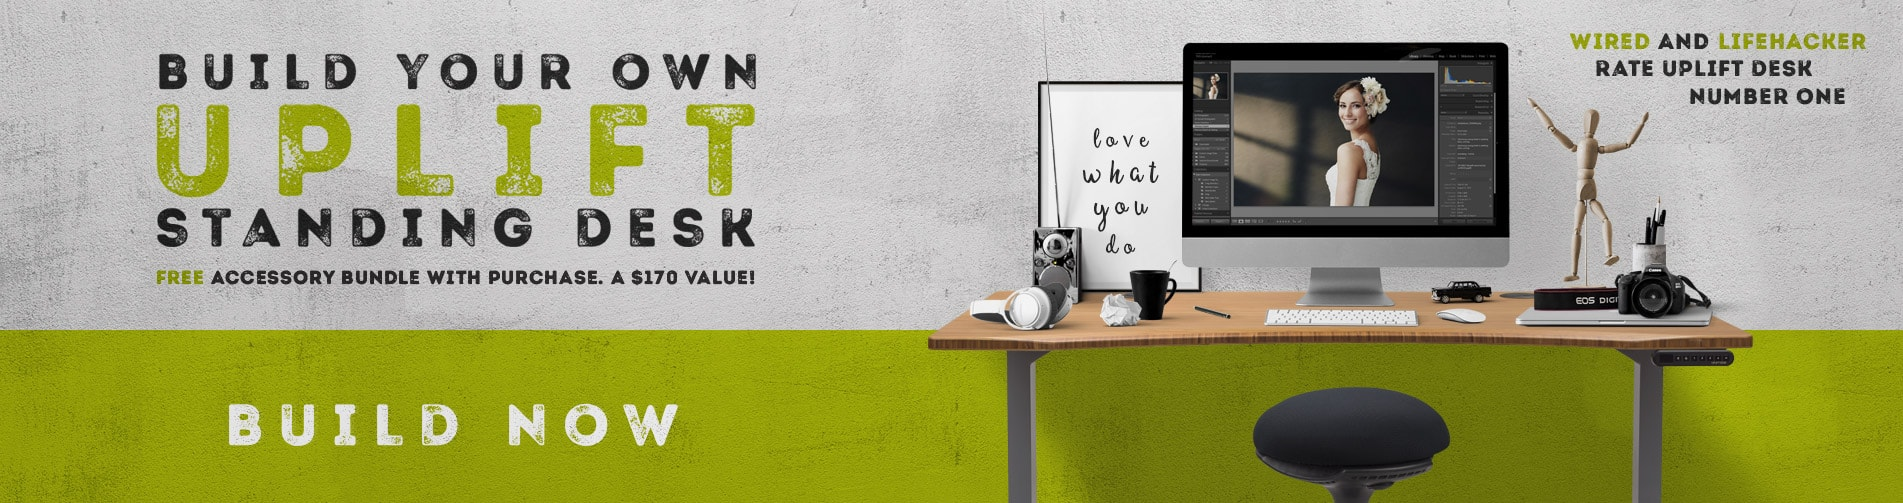 Build Your Own UPLIFT Standing Desk